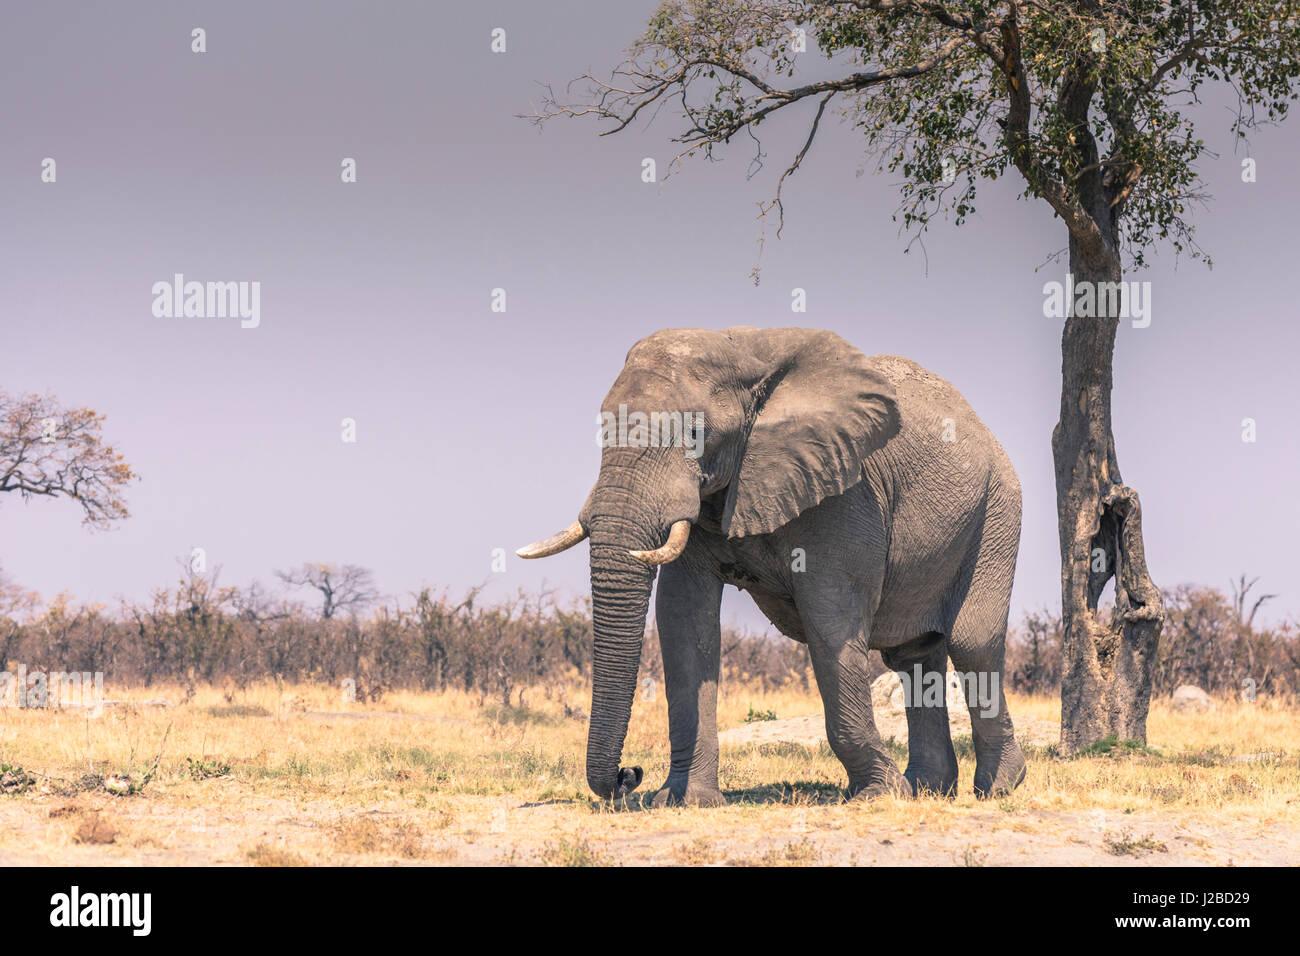 Botswana. Chobe National Park. Savuti. Elephant (Loxodonta africana) walking towards a water hole. - Stock Image